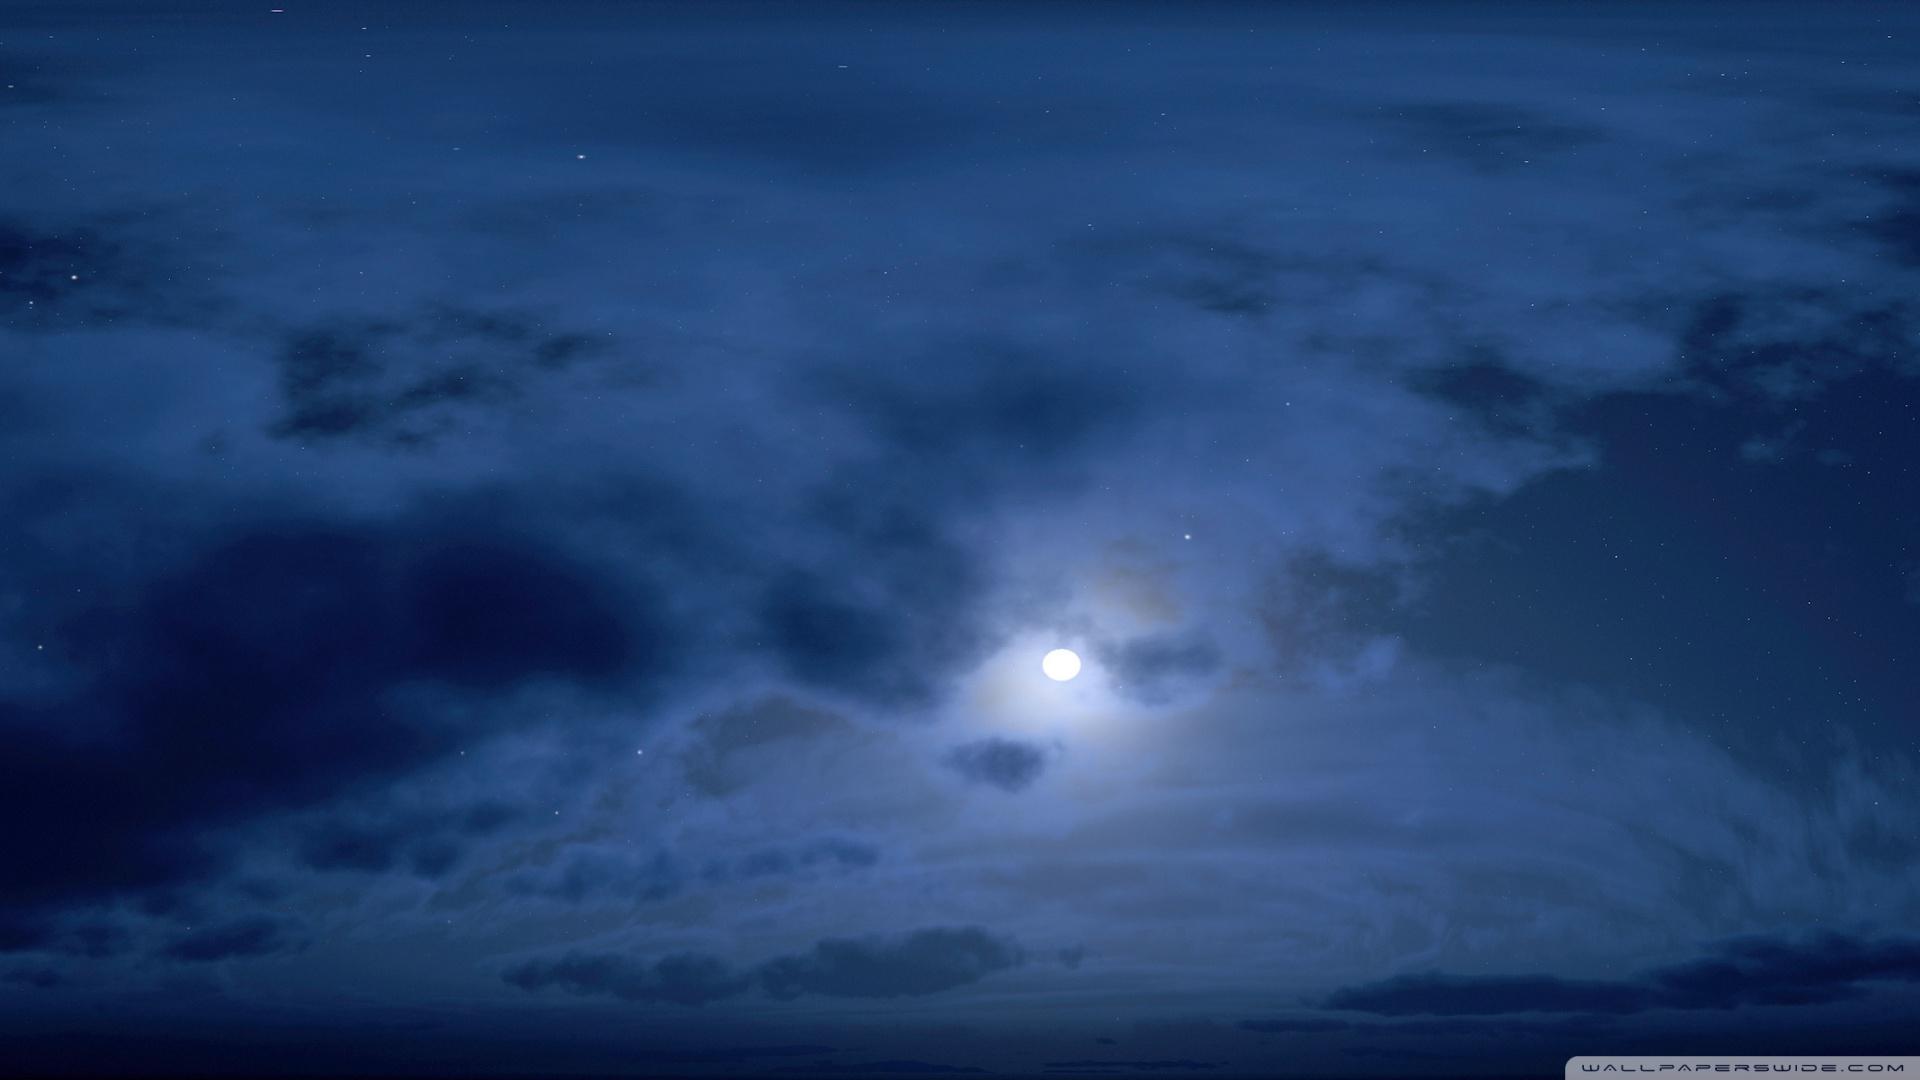 Night Sky Wallpaper 1920x1080 Night Sky 1920x1080